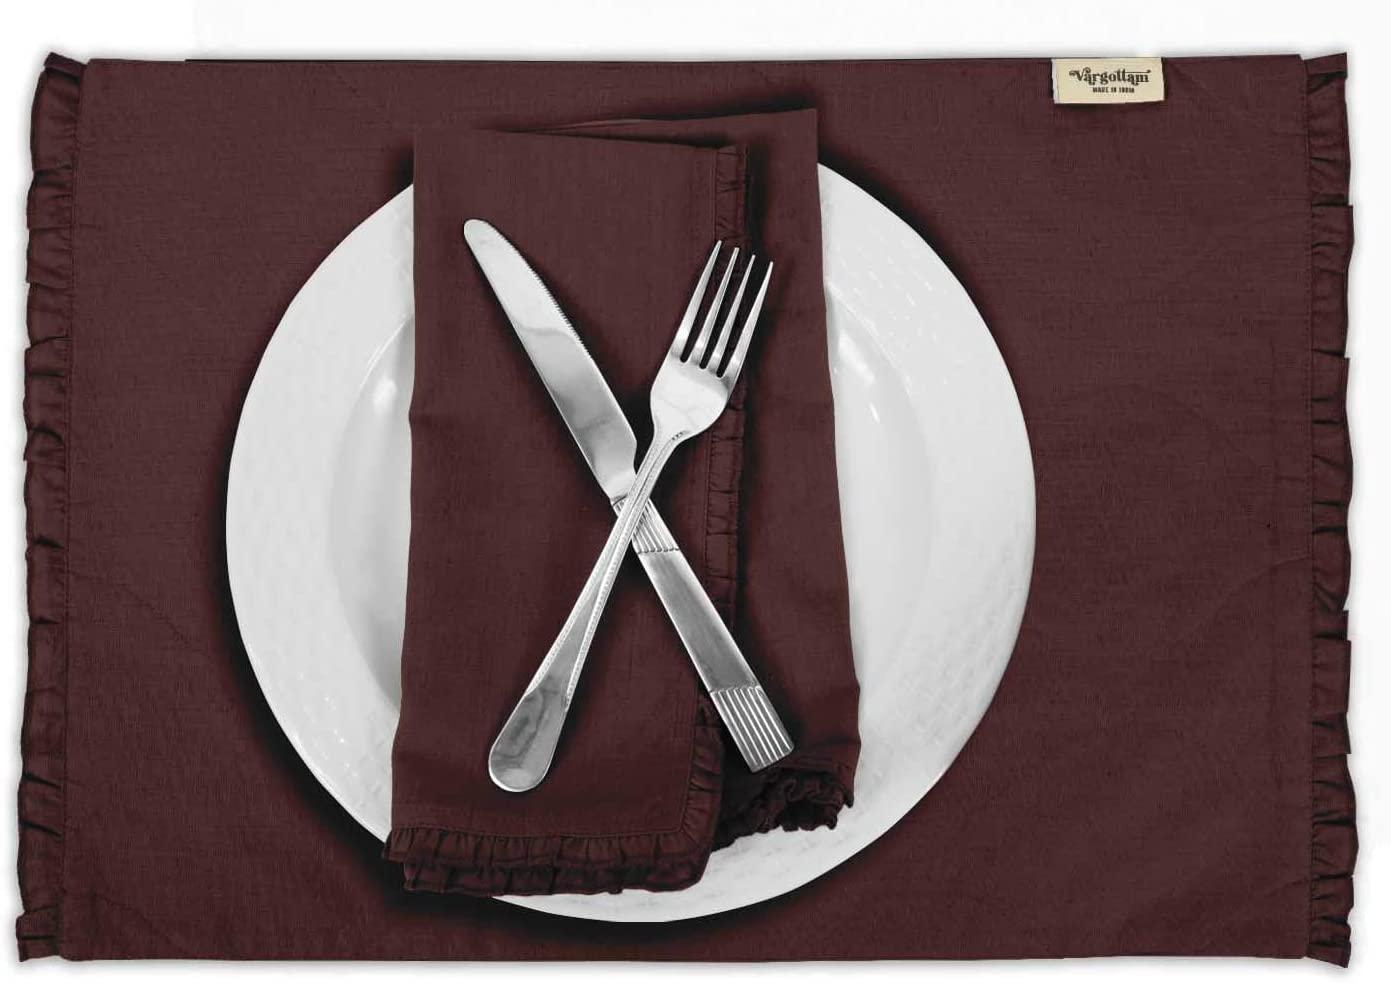 Vargottam Wine Home Décor Washable Dining Table Mats Reversible Cotton Flex Frill Placemat-Set of 6